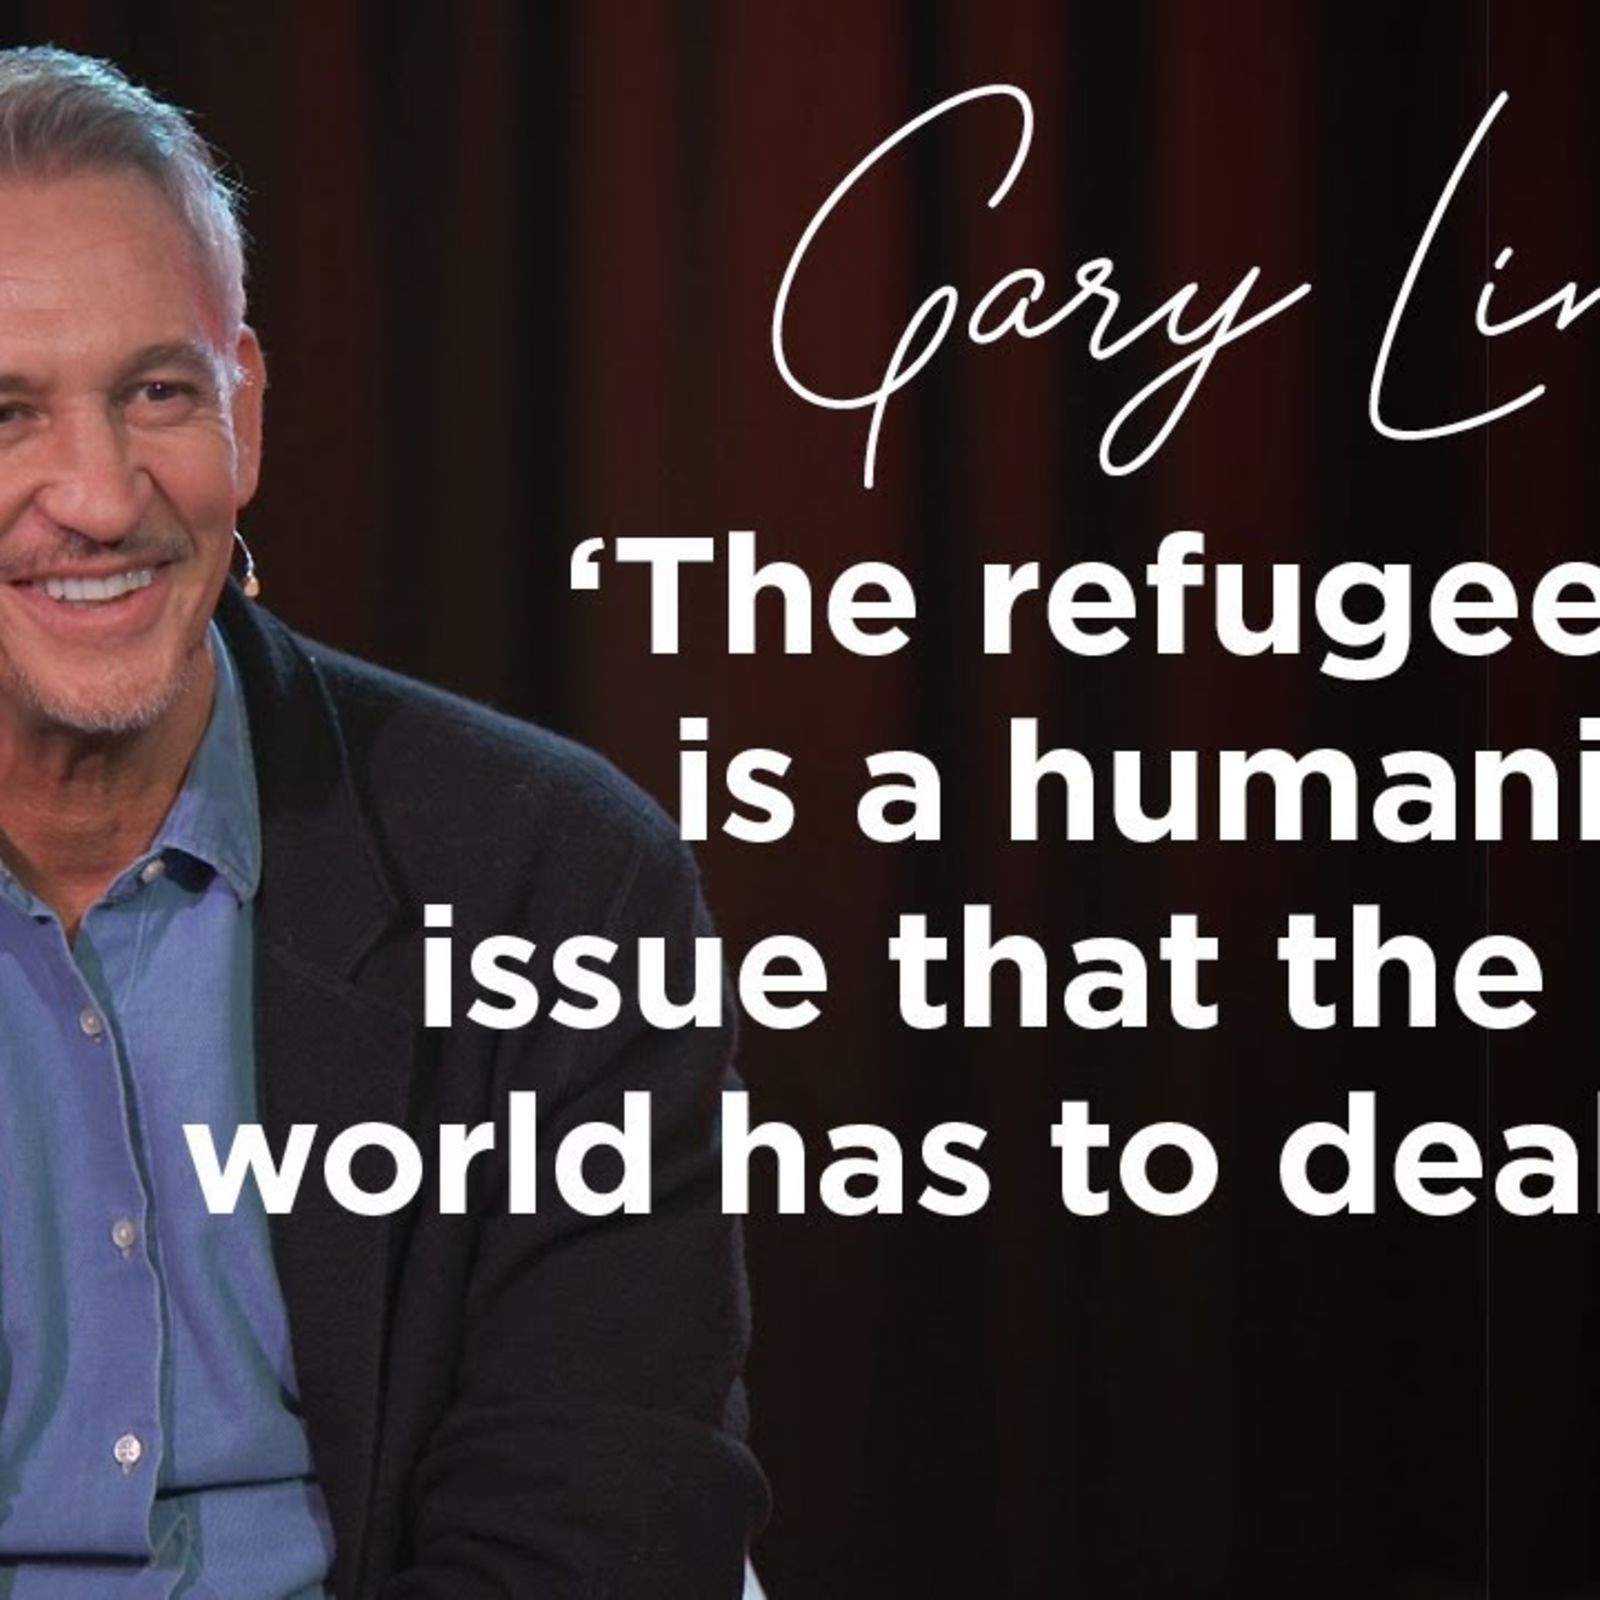 Gary Lineker on the BBC, Marcus Rashford and taking in a refugee